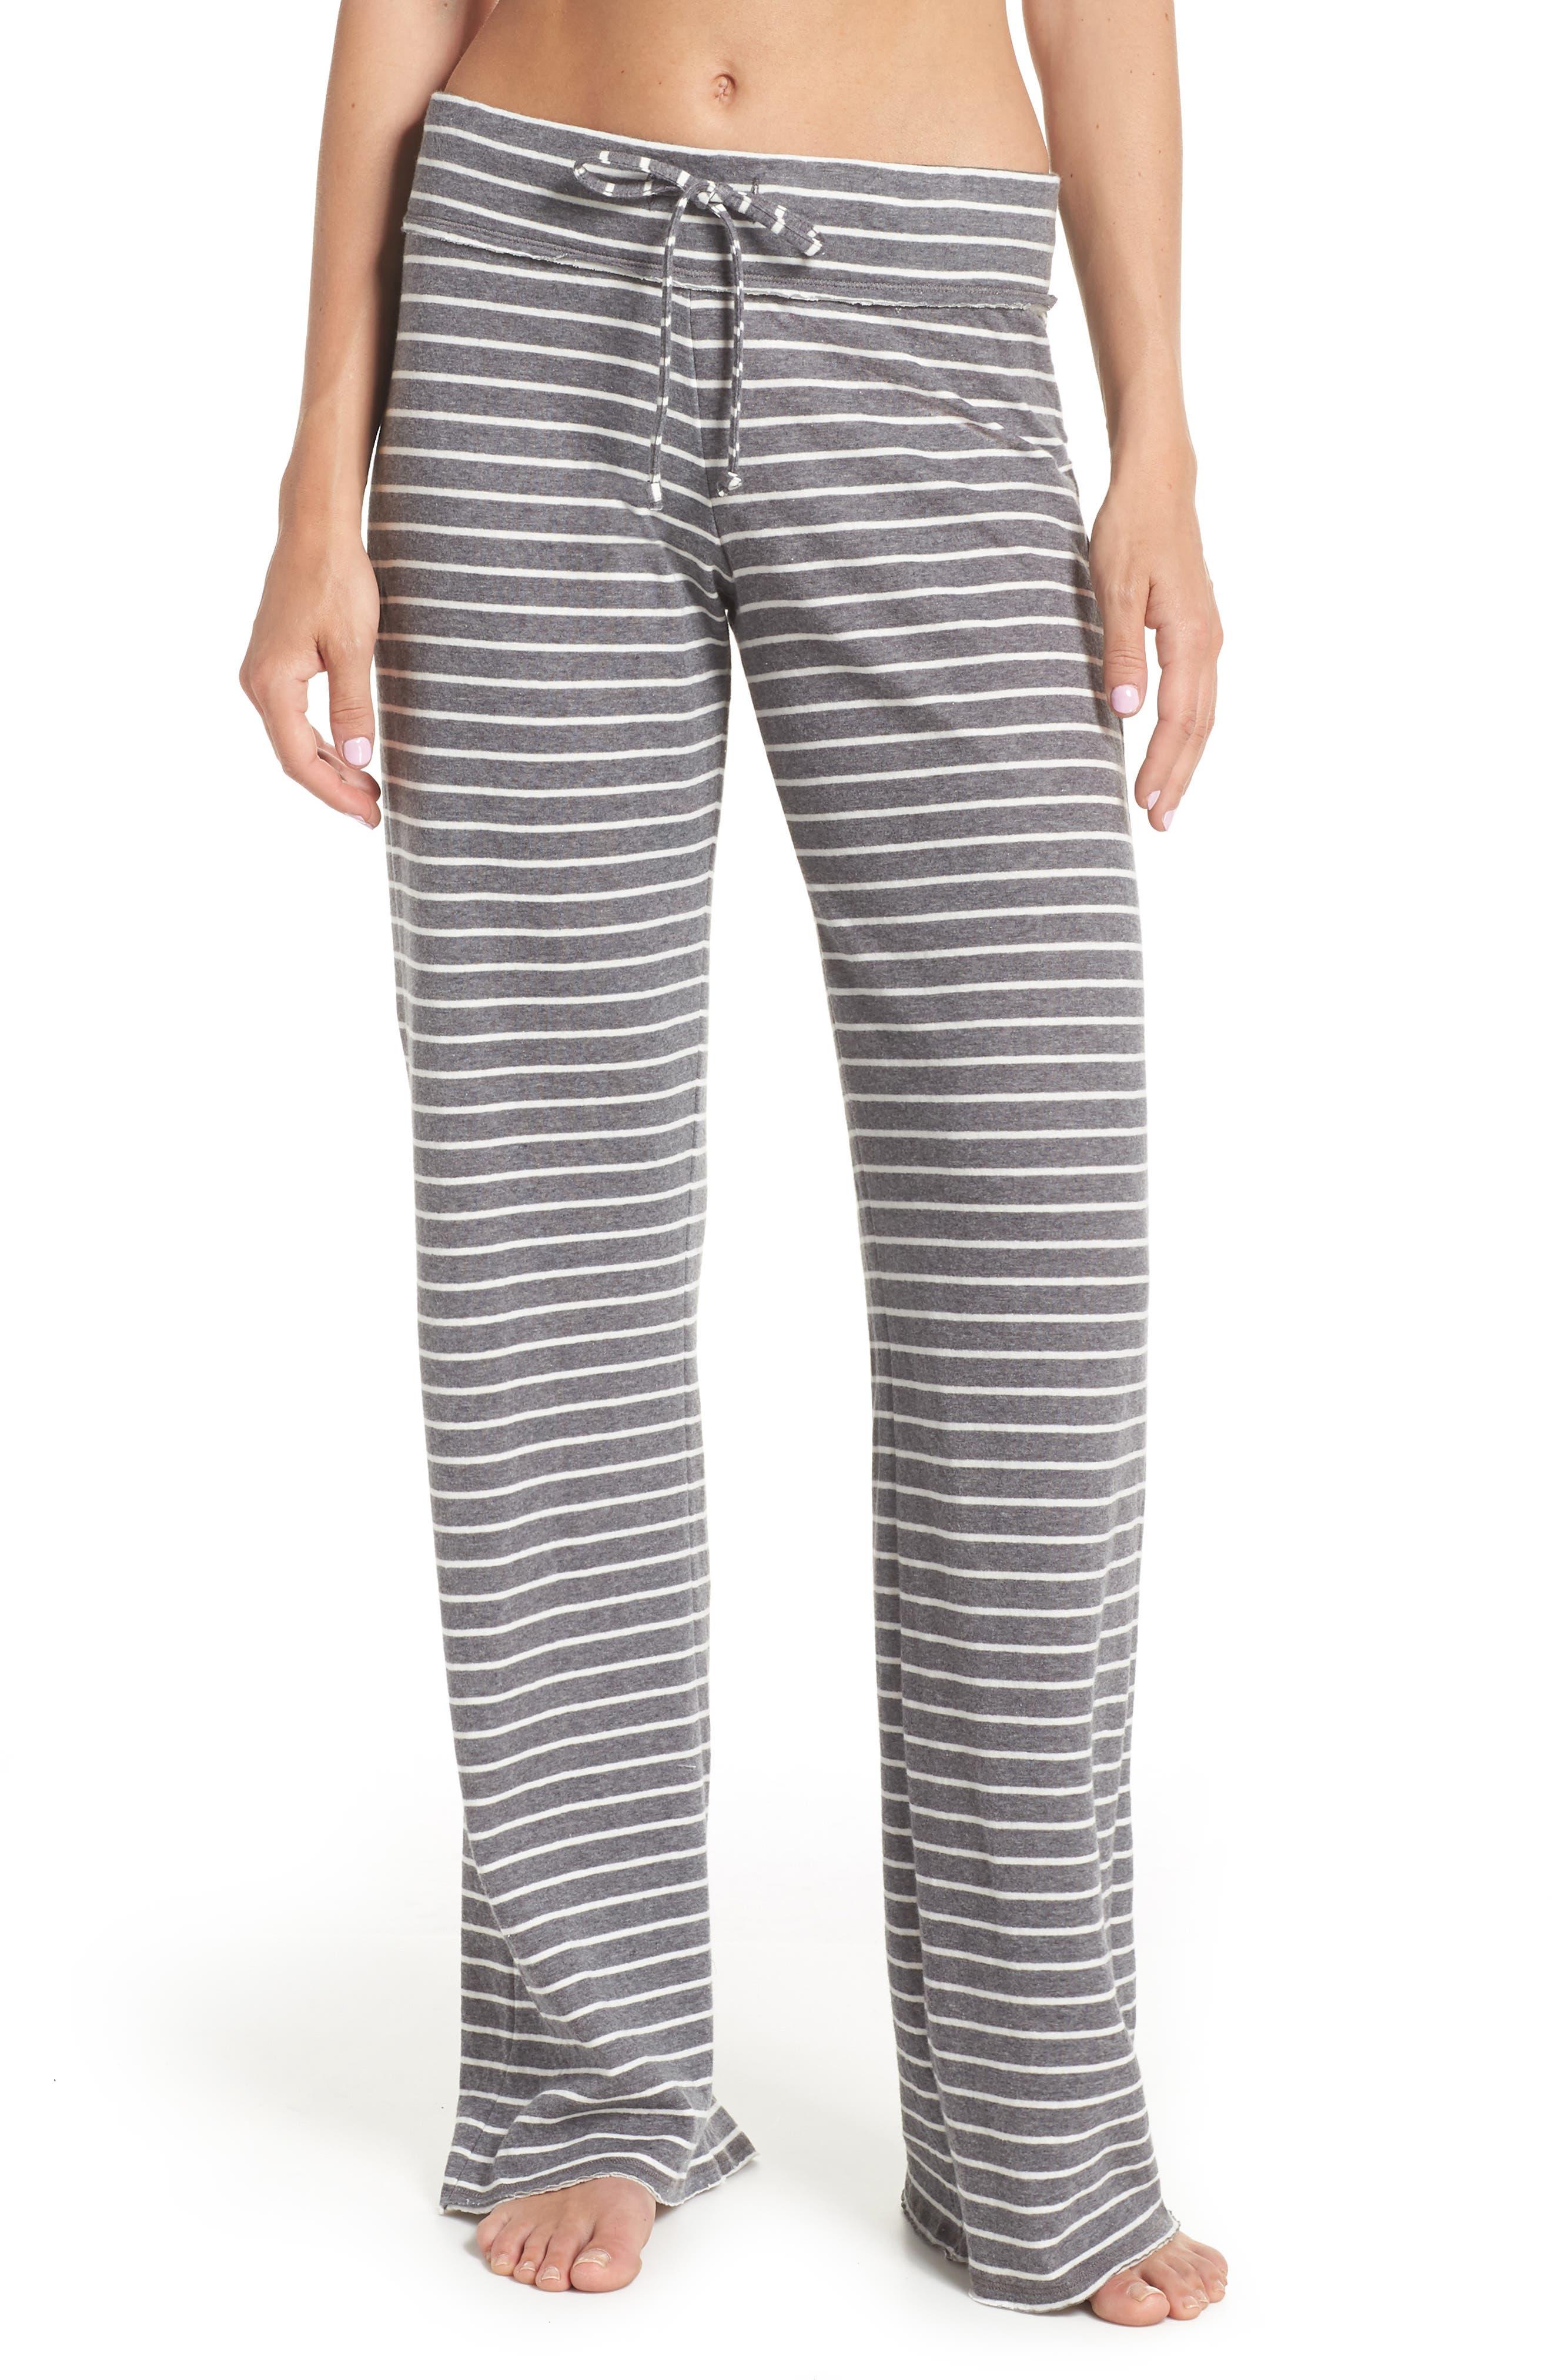 'Lazy Mornings' Lounge Pants,                             Main thumbnail 1, color,                             GREY PAVEMENT BELLA STRIPE